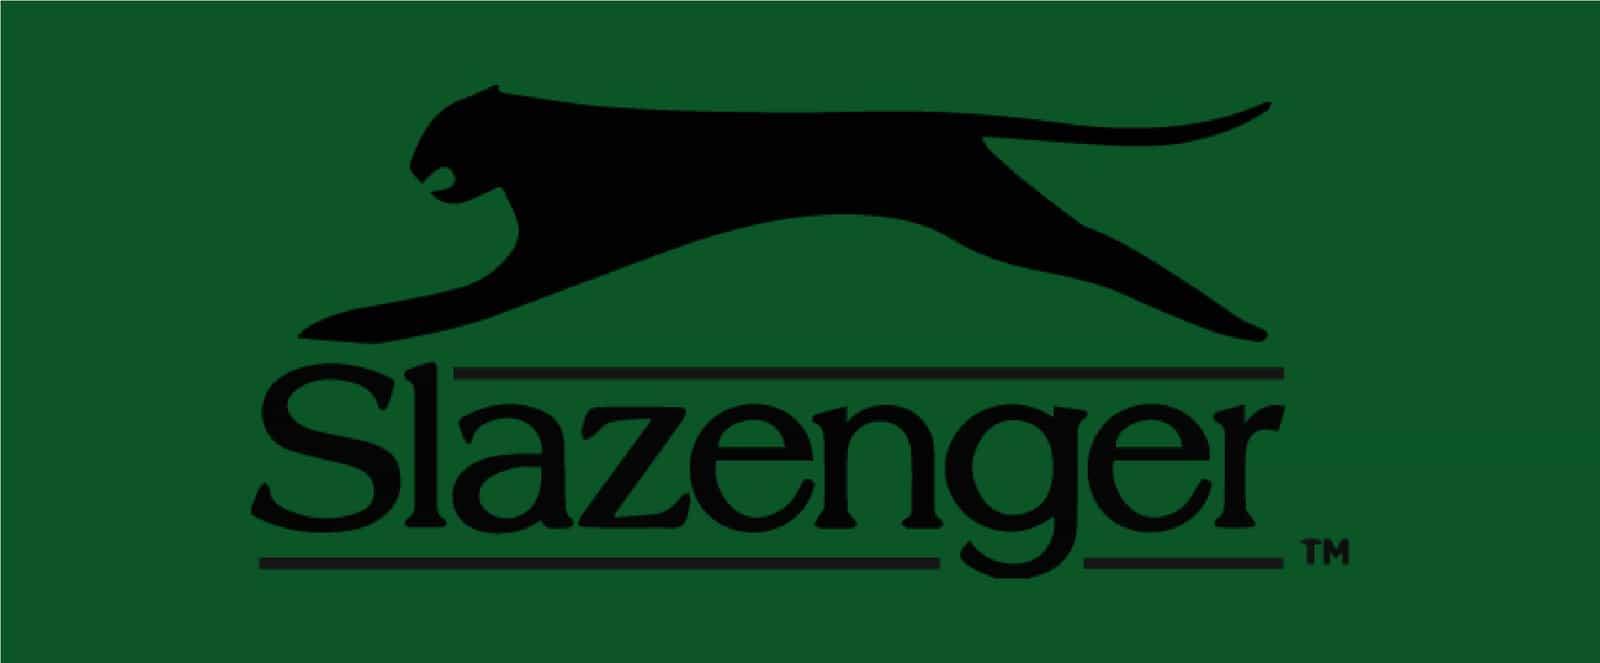 Slazenger Logo on Wimbledon Green Background